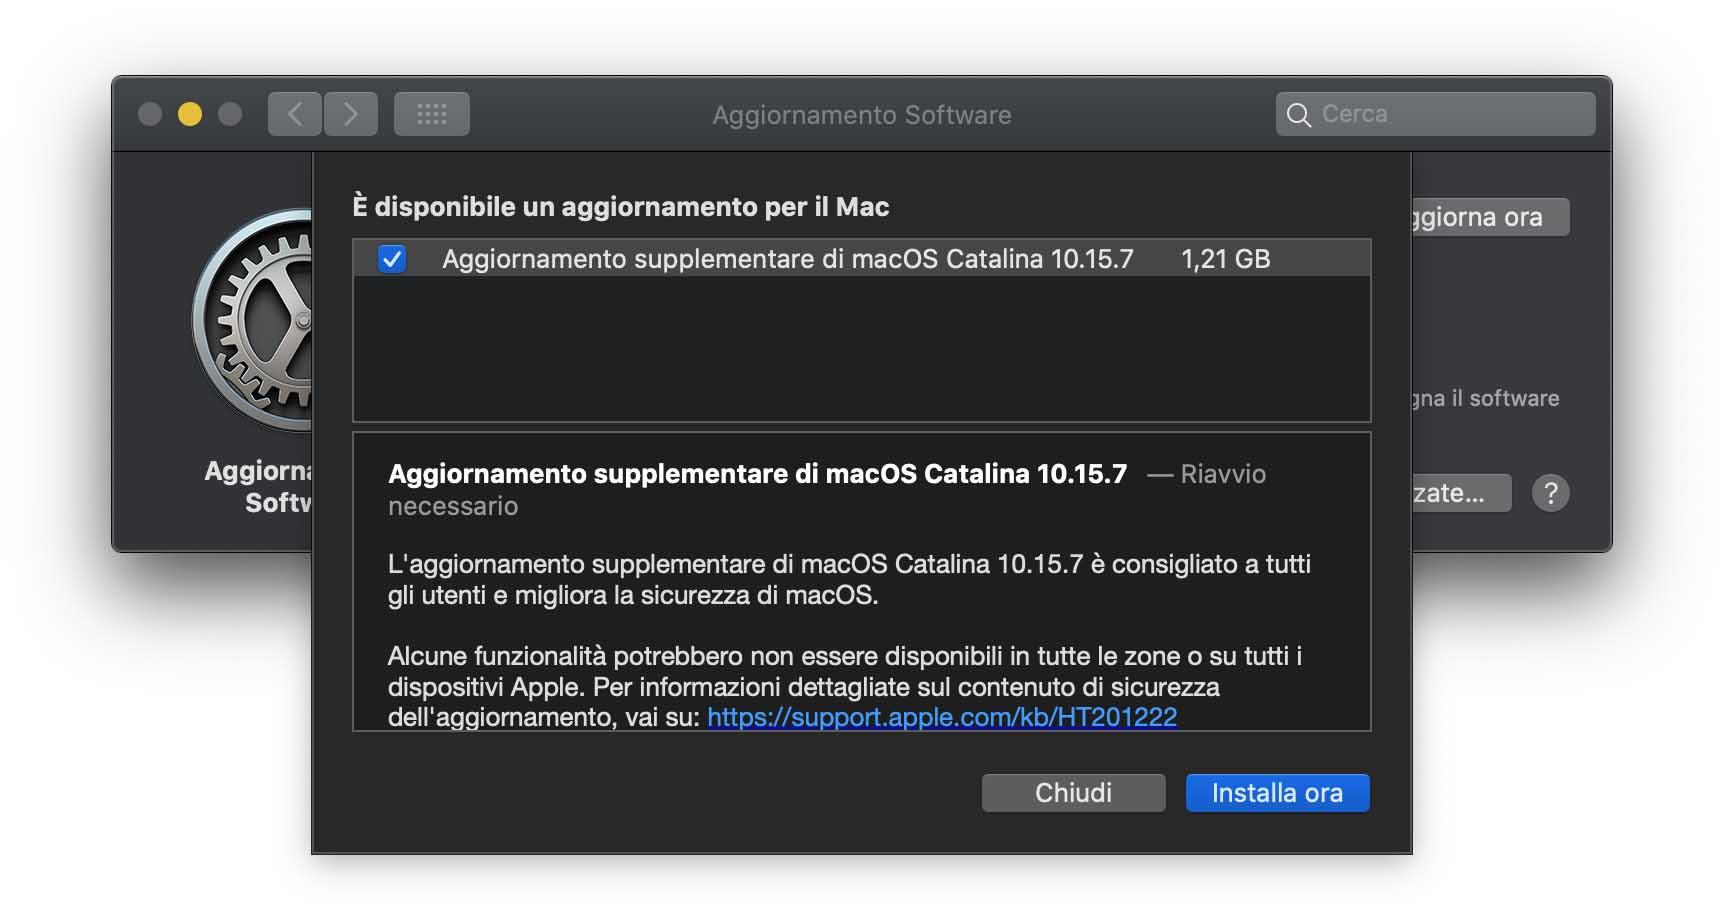 Update supplementare per macOS Catalina 10.15.7